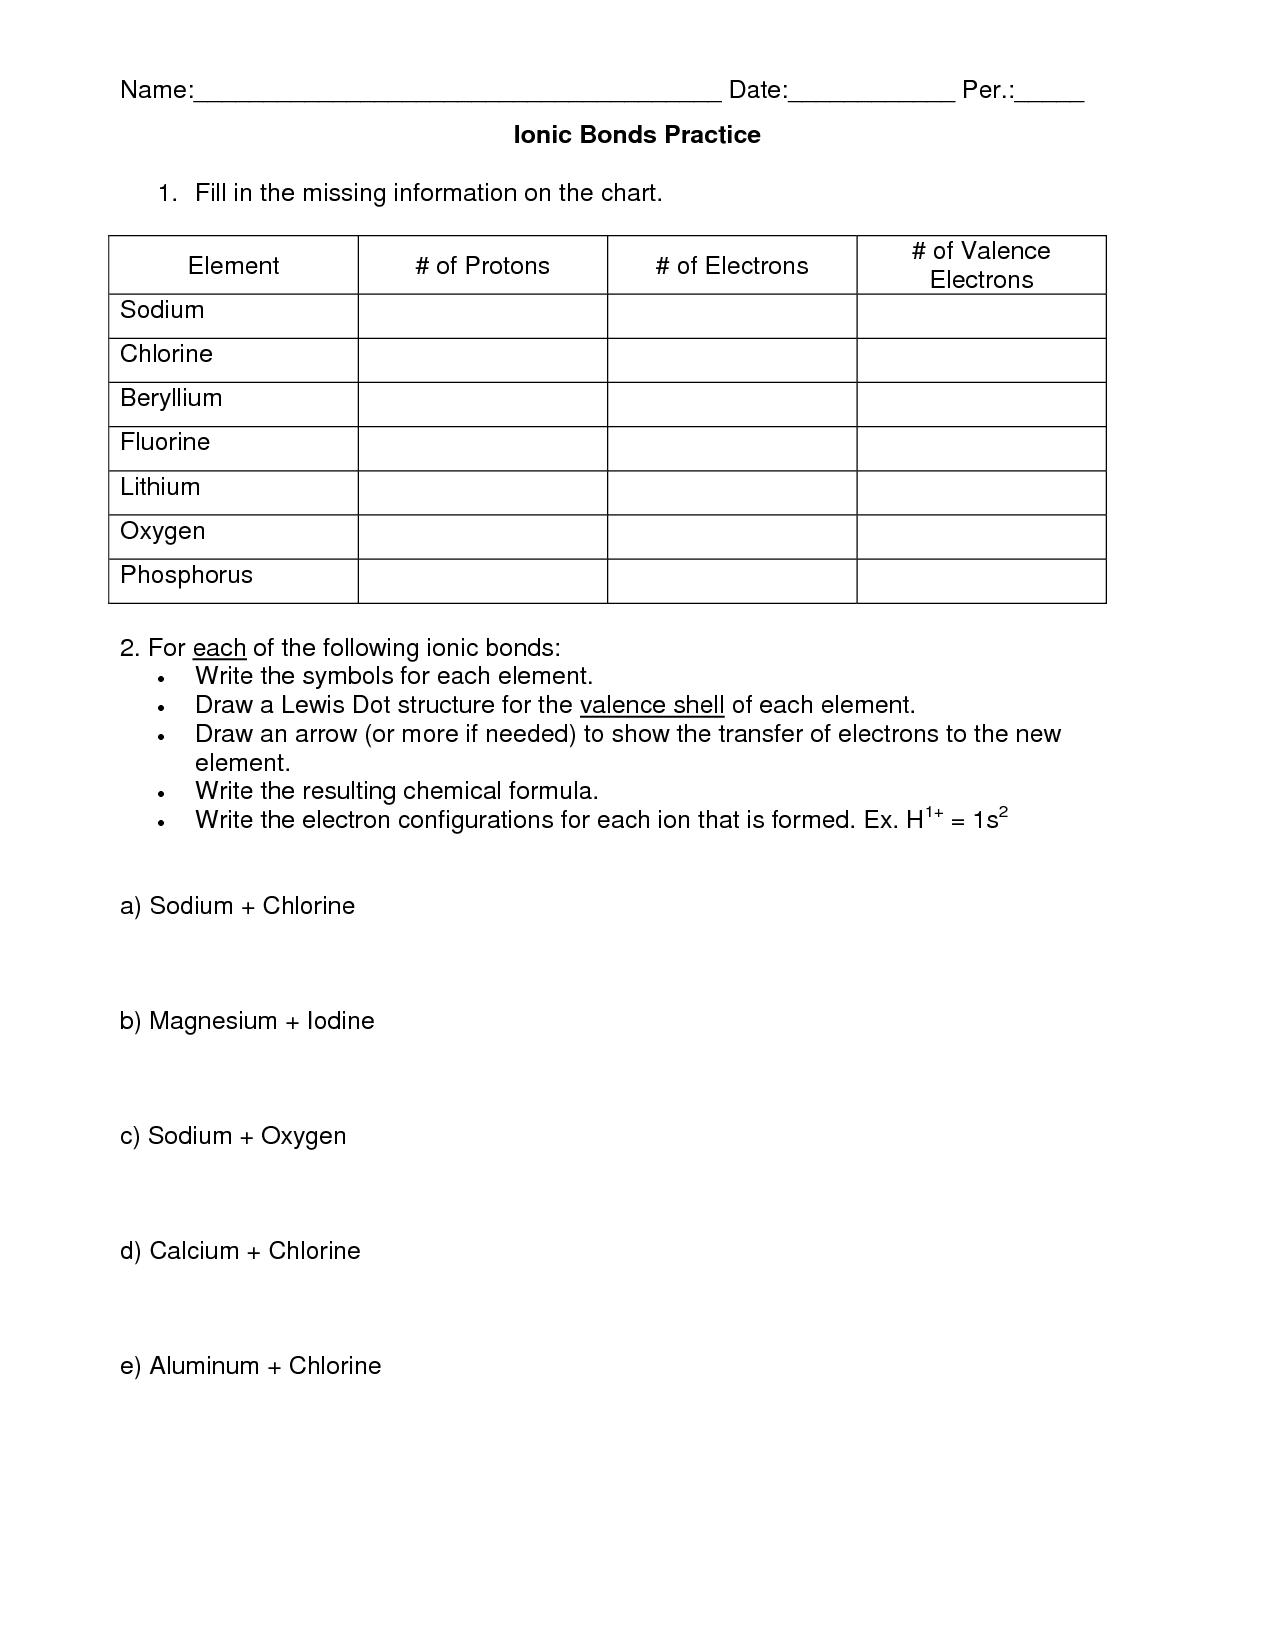 Chemical Bonds Ionic Bonds Worksheet Answers